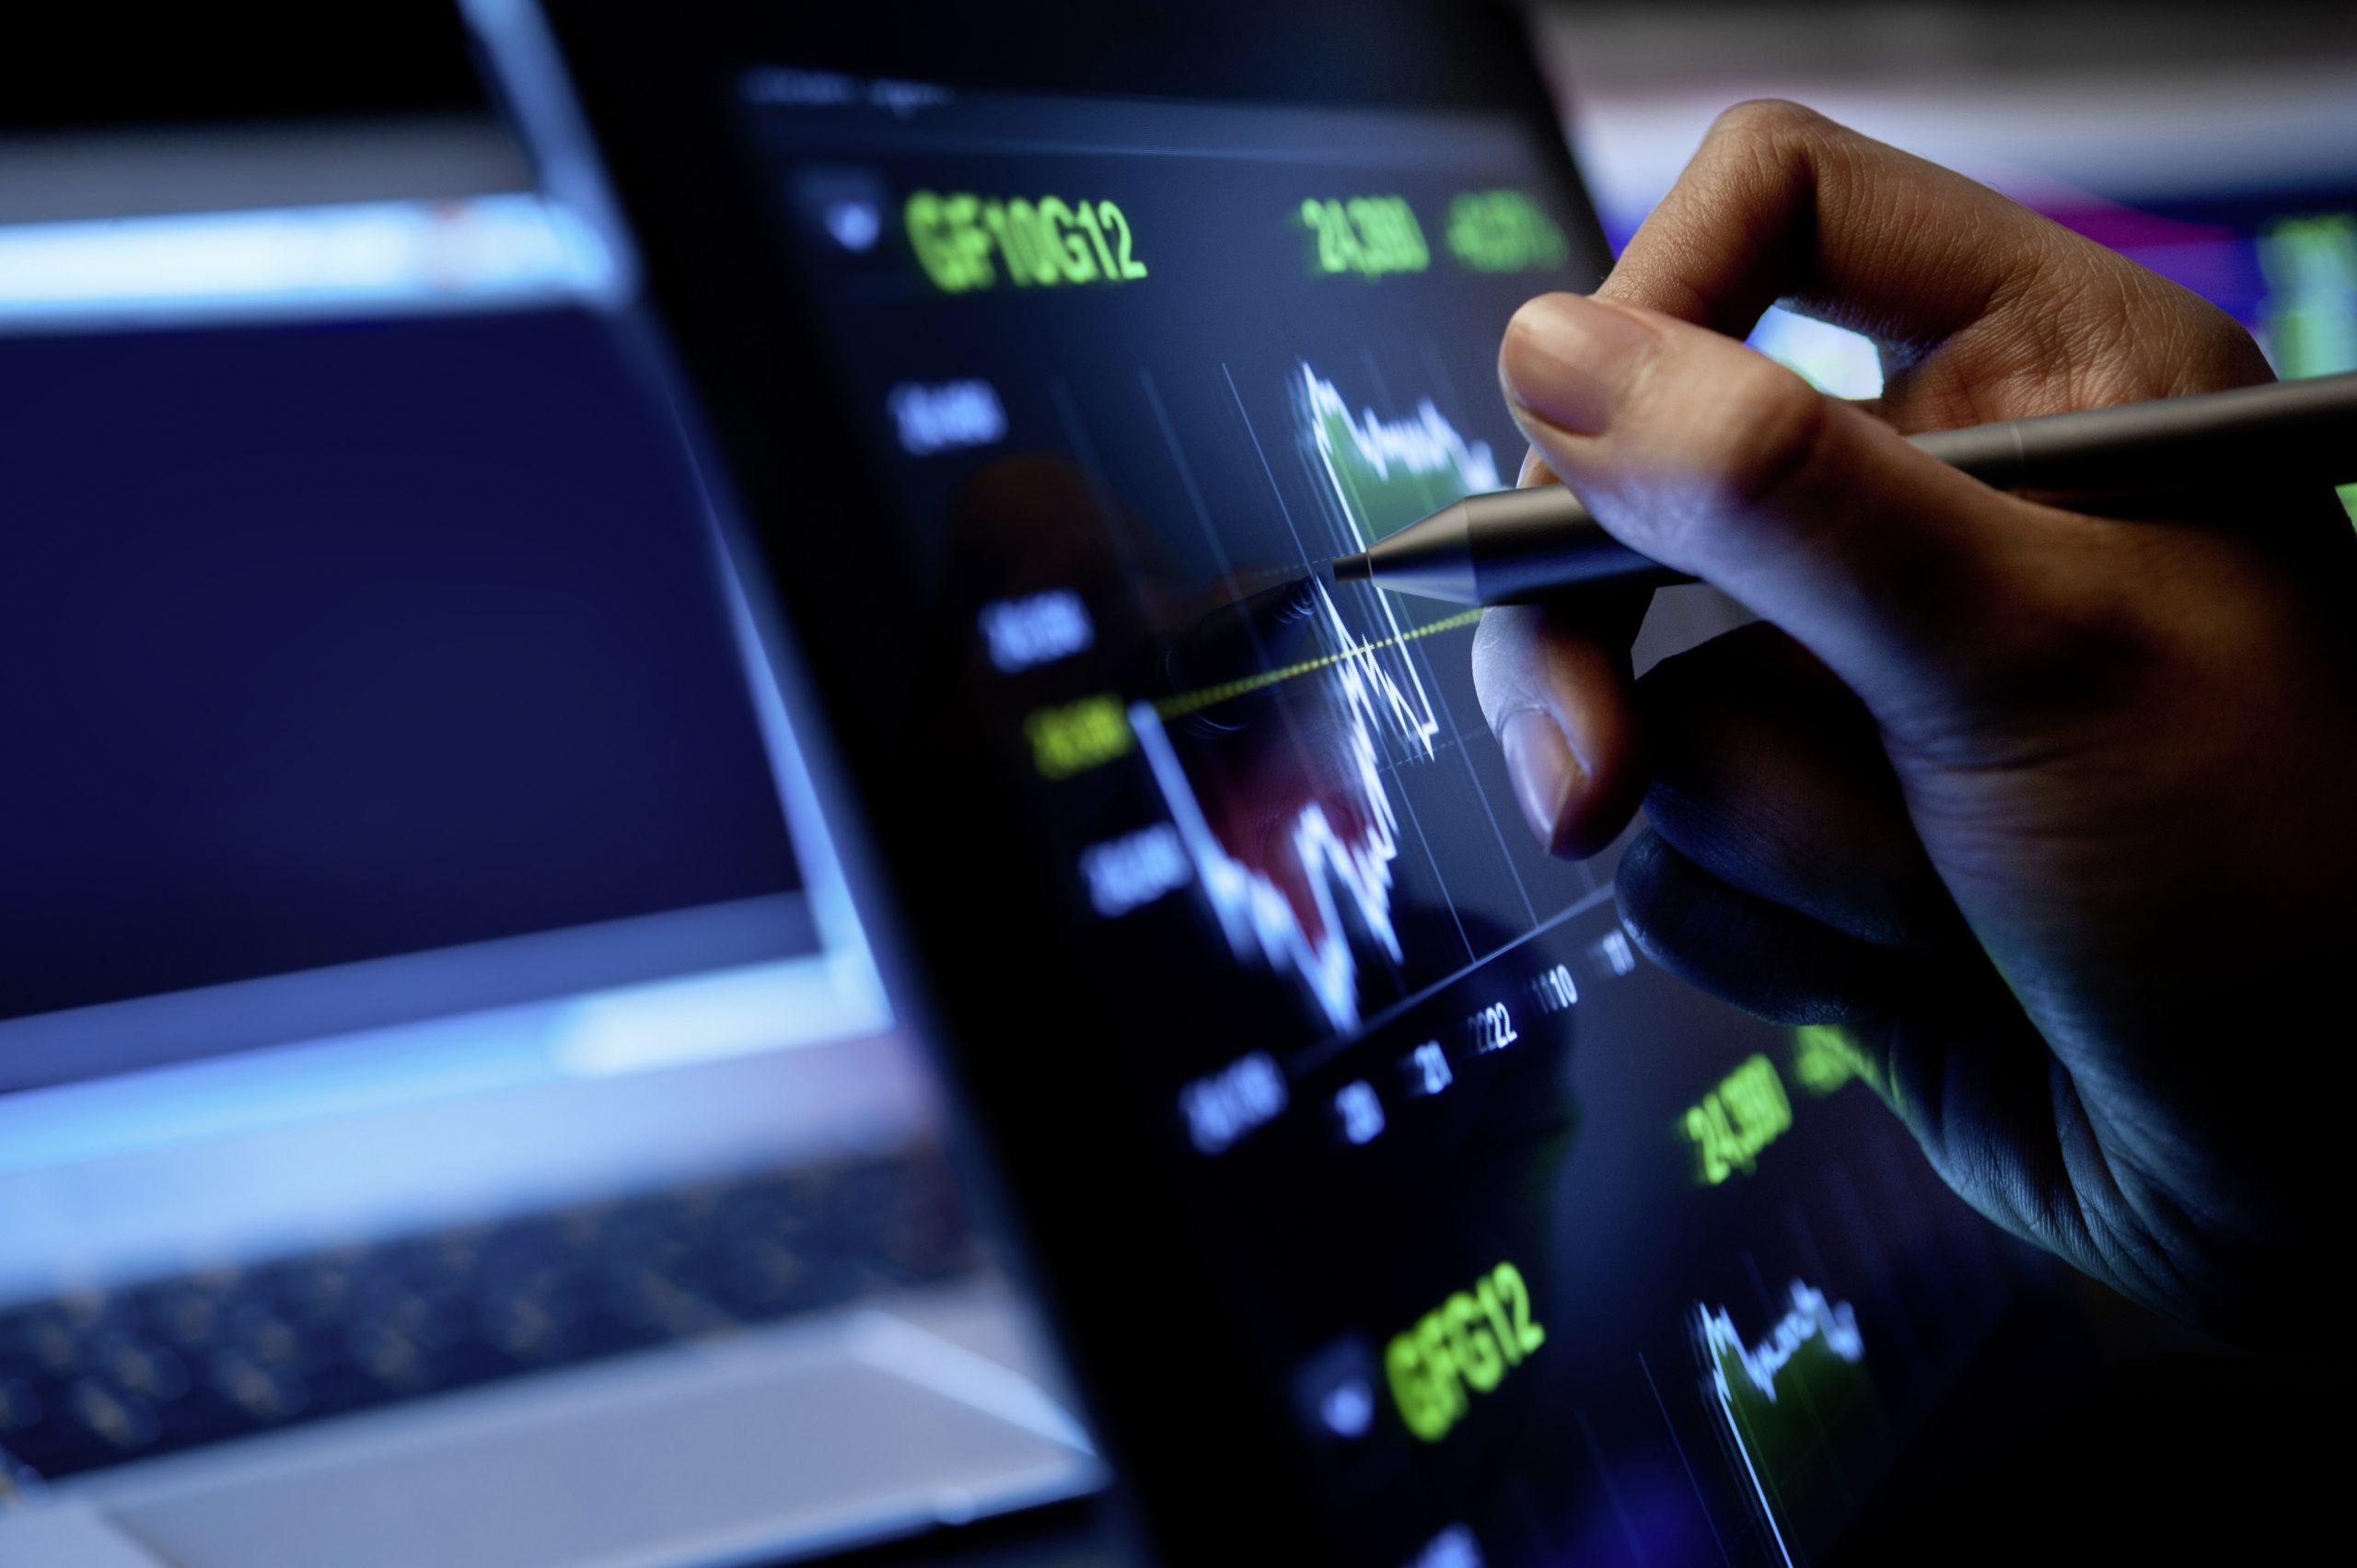 Enterprise analytics on a tablet